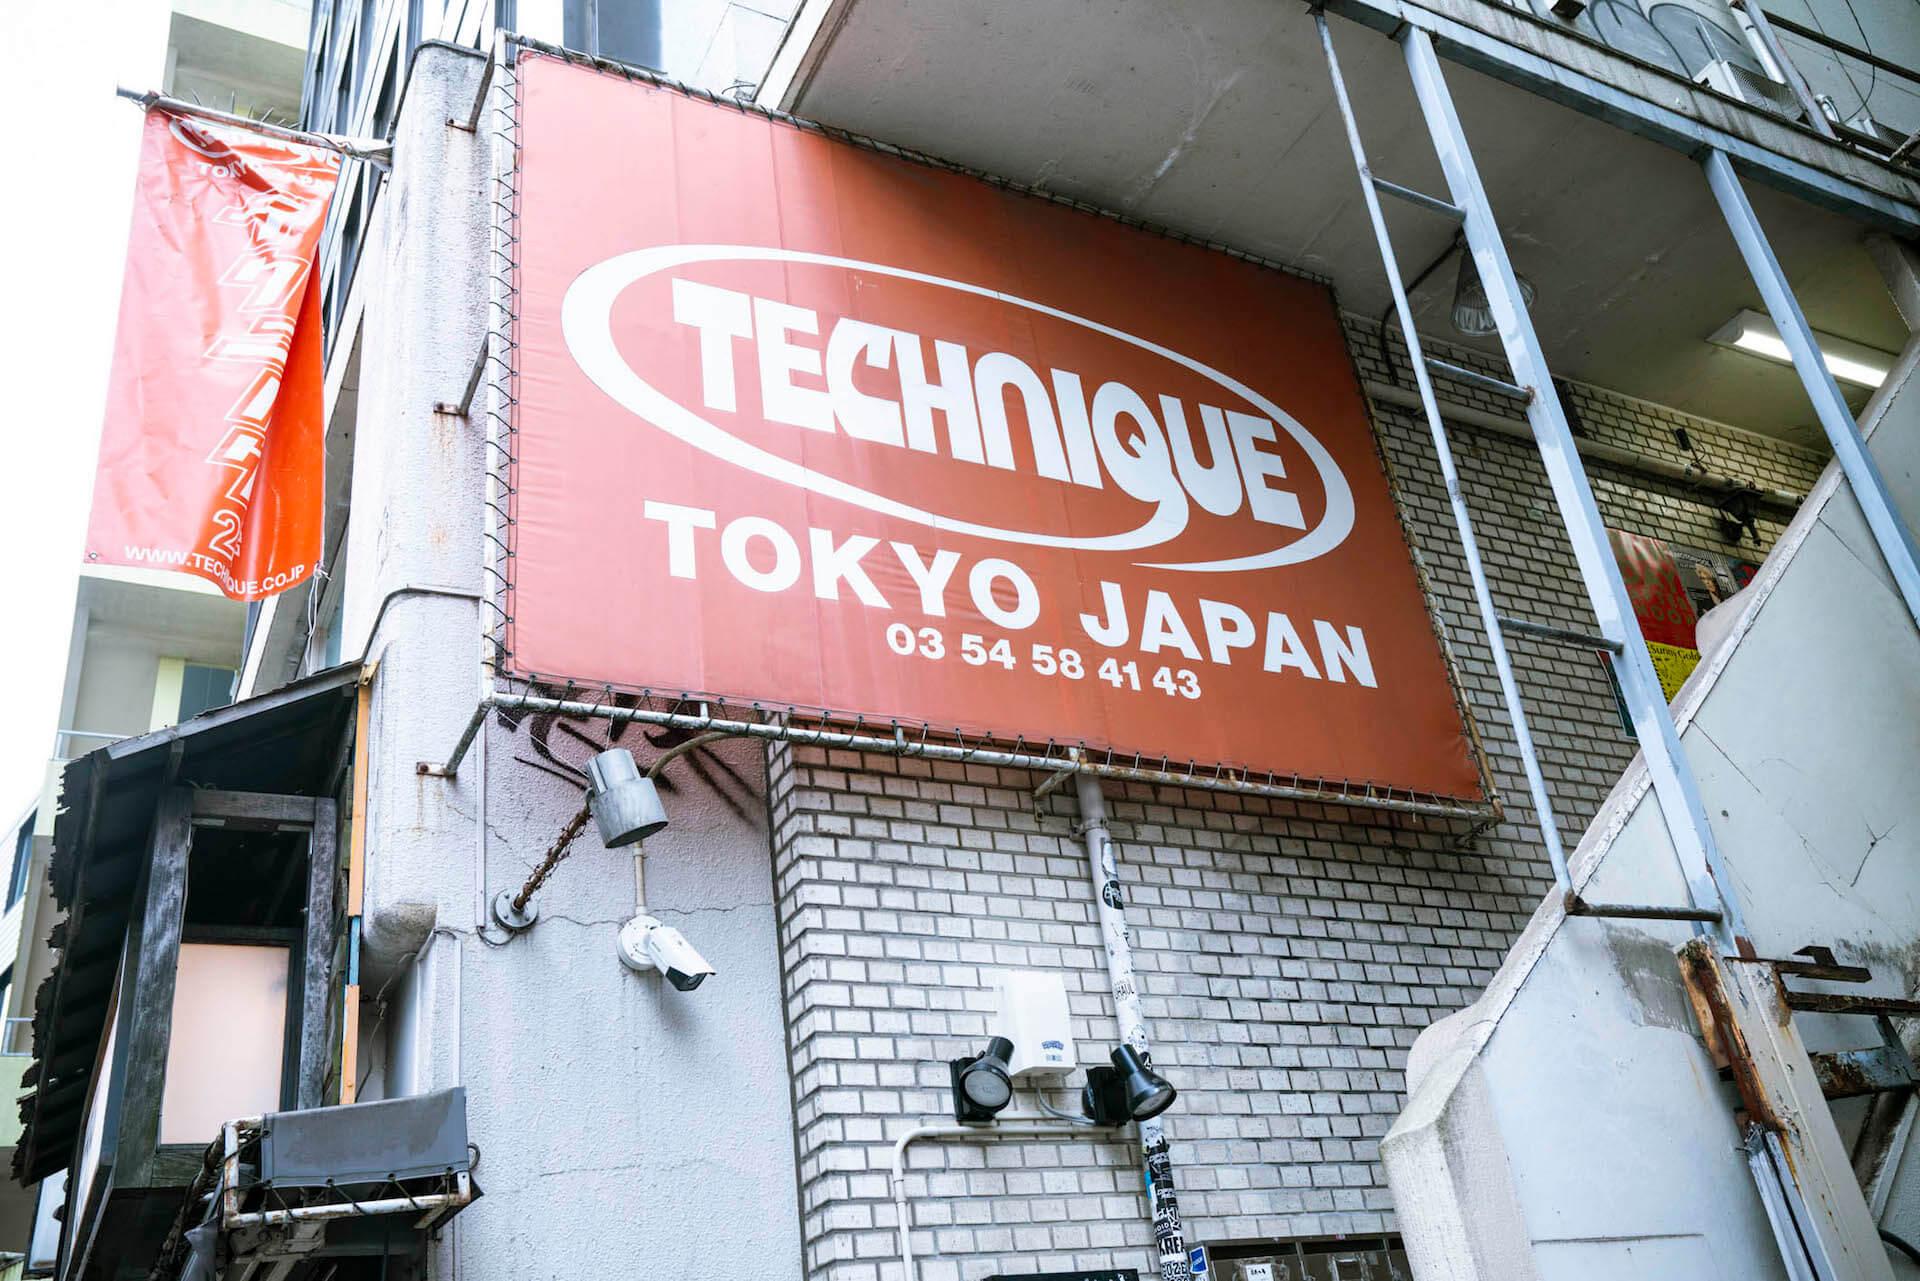 Get To Know Vol.3 Technique gettoknow-technique-14